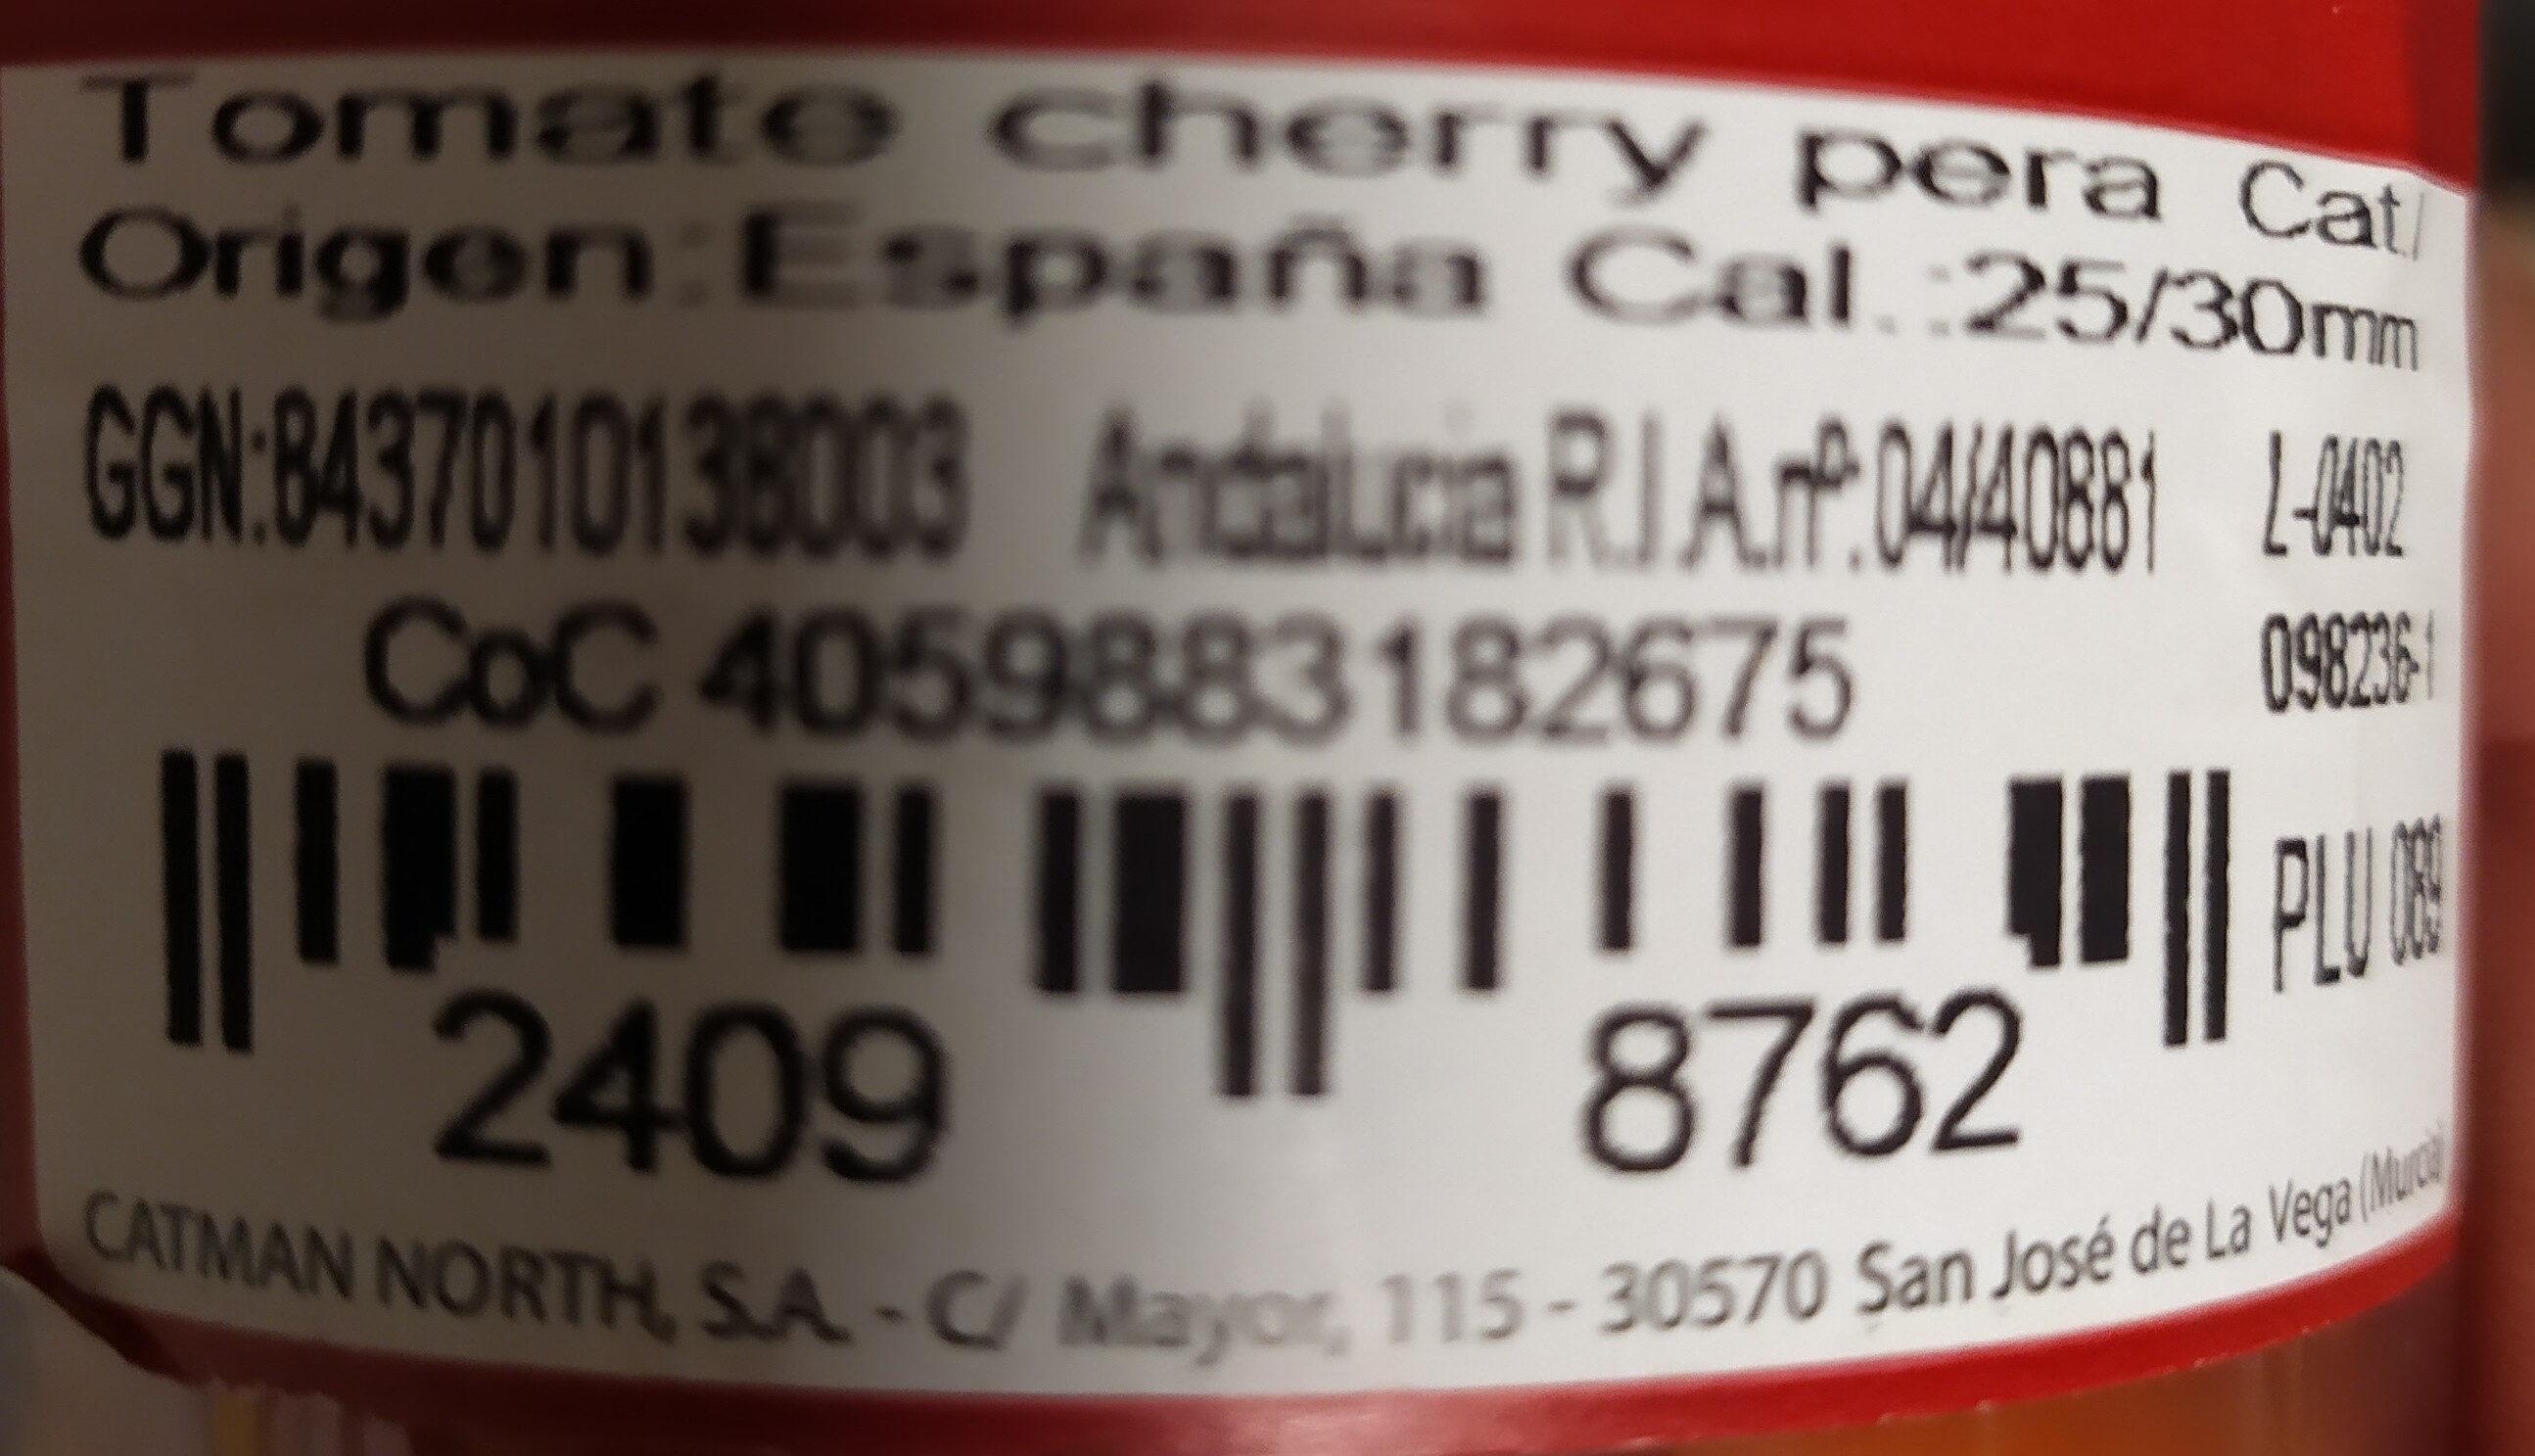 Tomate cherry pera - Inhaltsstoffe - fr